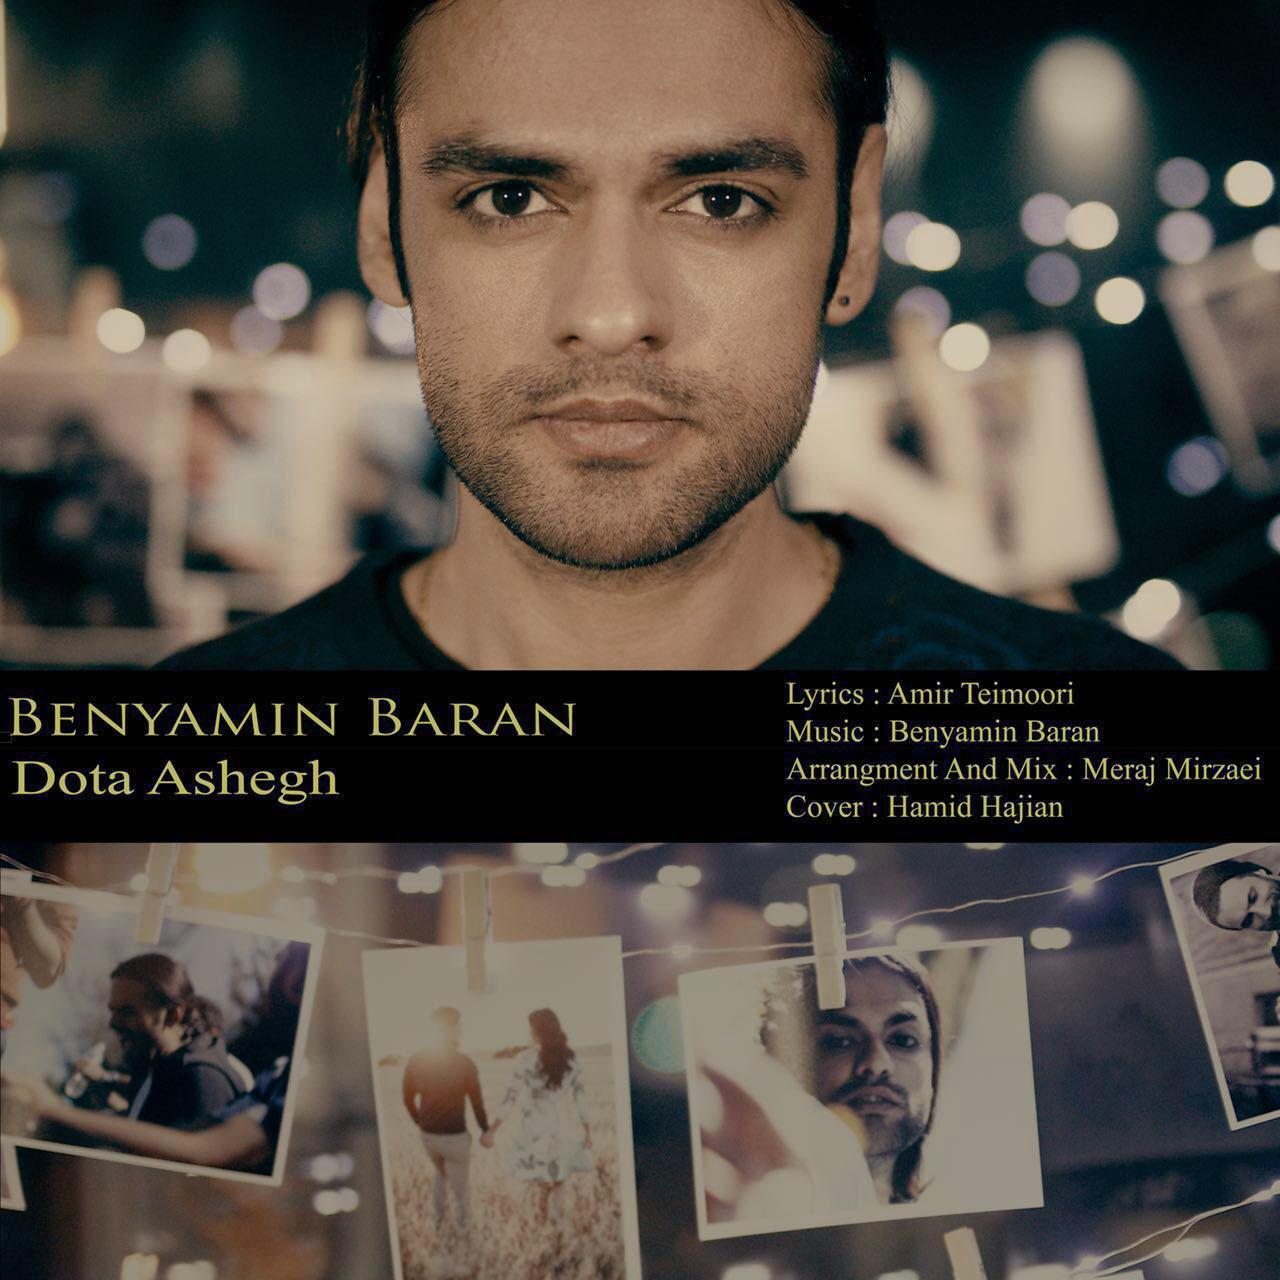 Benyamin Baran – Dota Ashegh